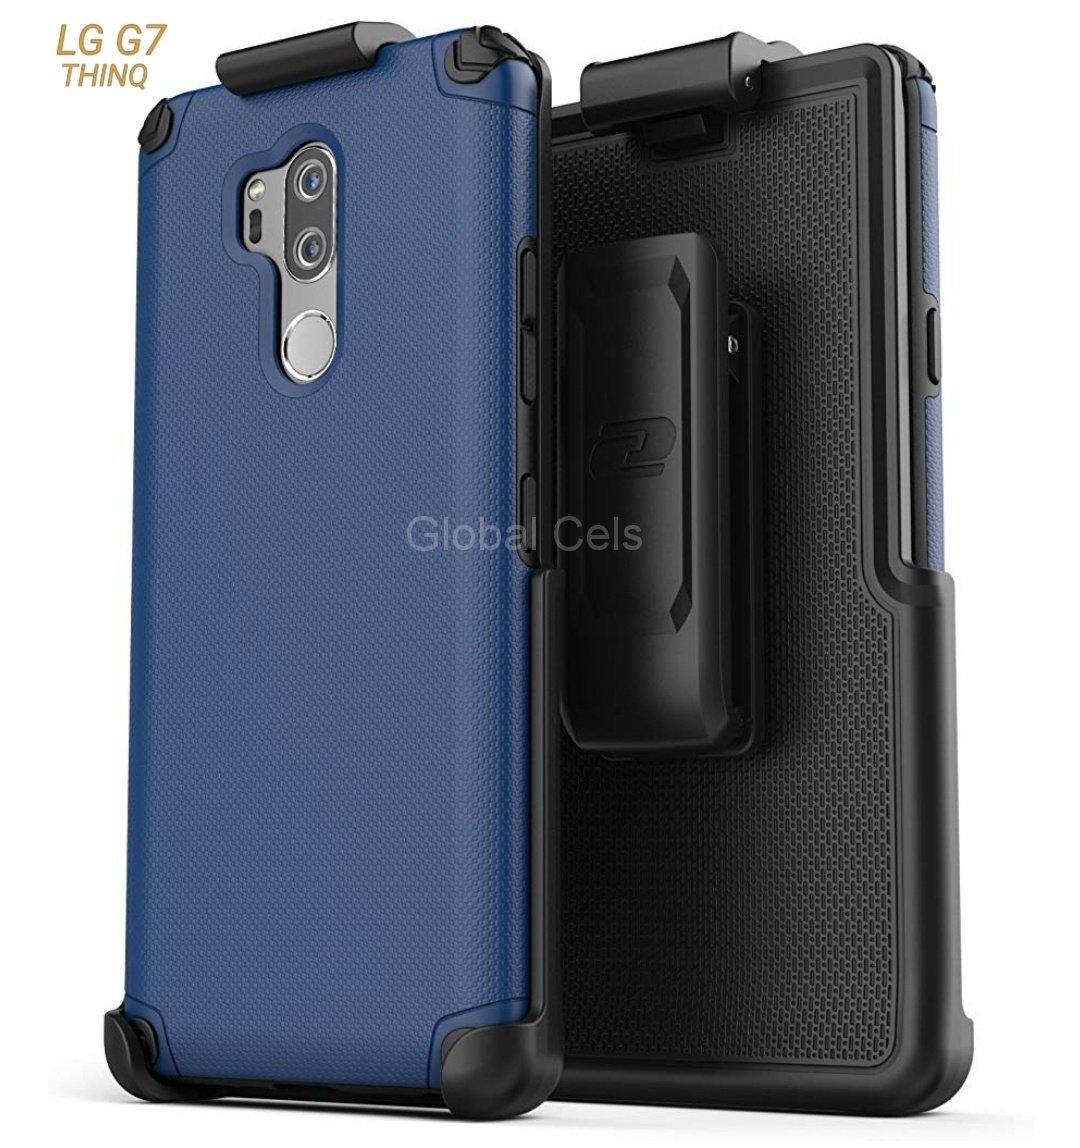 Case LG G7 Thinq Protector c/ Gancho Especial para Correa